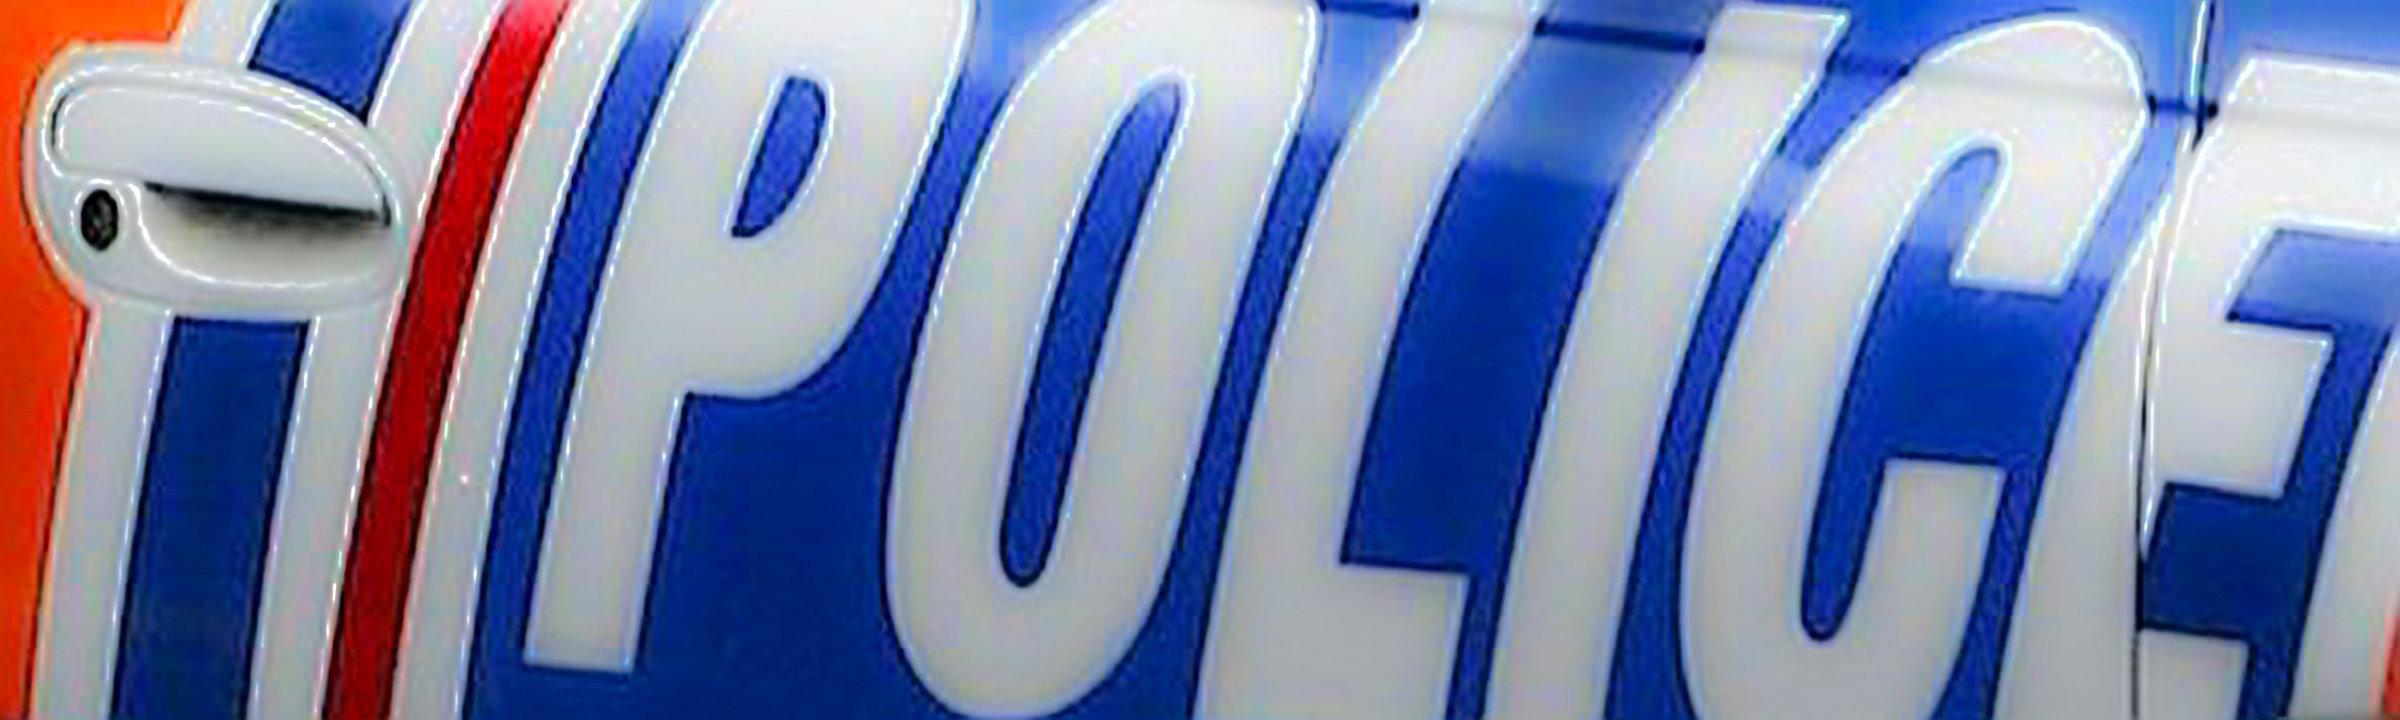 Polizei Auto auf Neuseeland